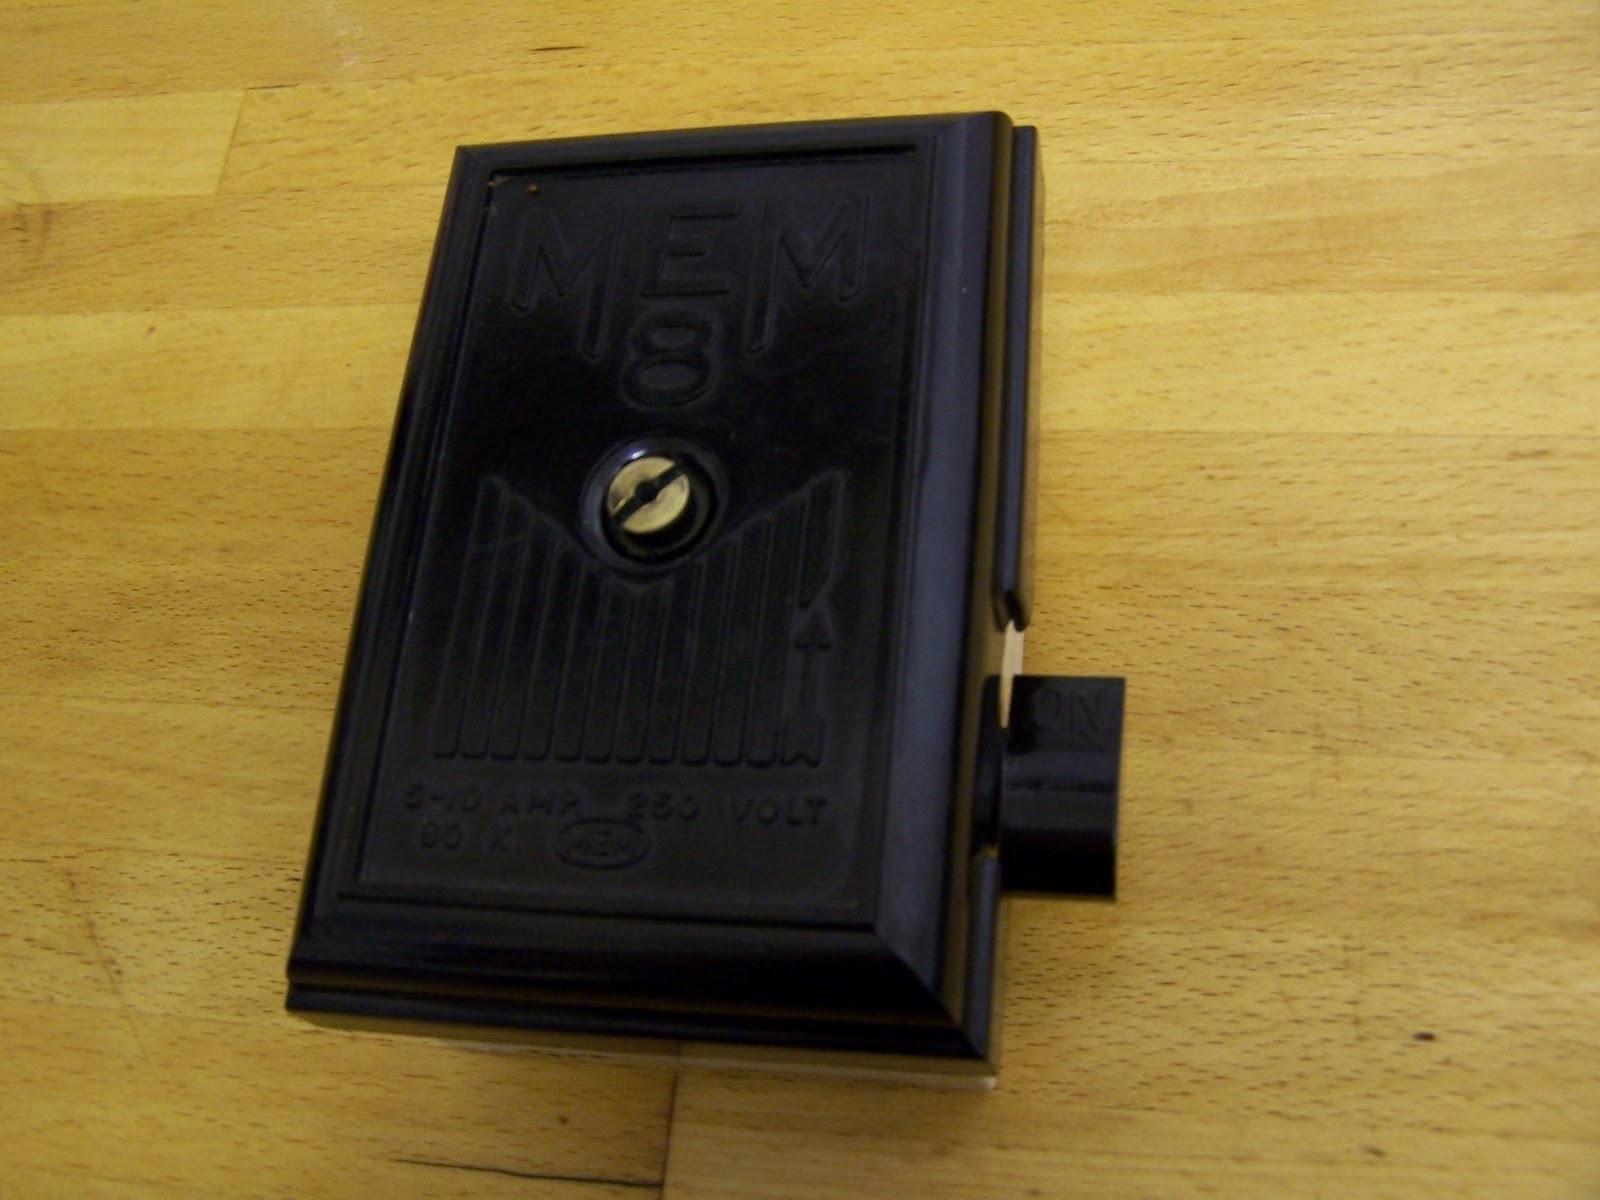 hotel fuse box    hotel    stormy monday old mem    fuse       box        hotel    stormy monday old mem    fuse       box